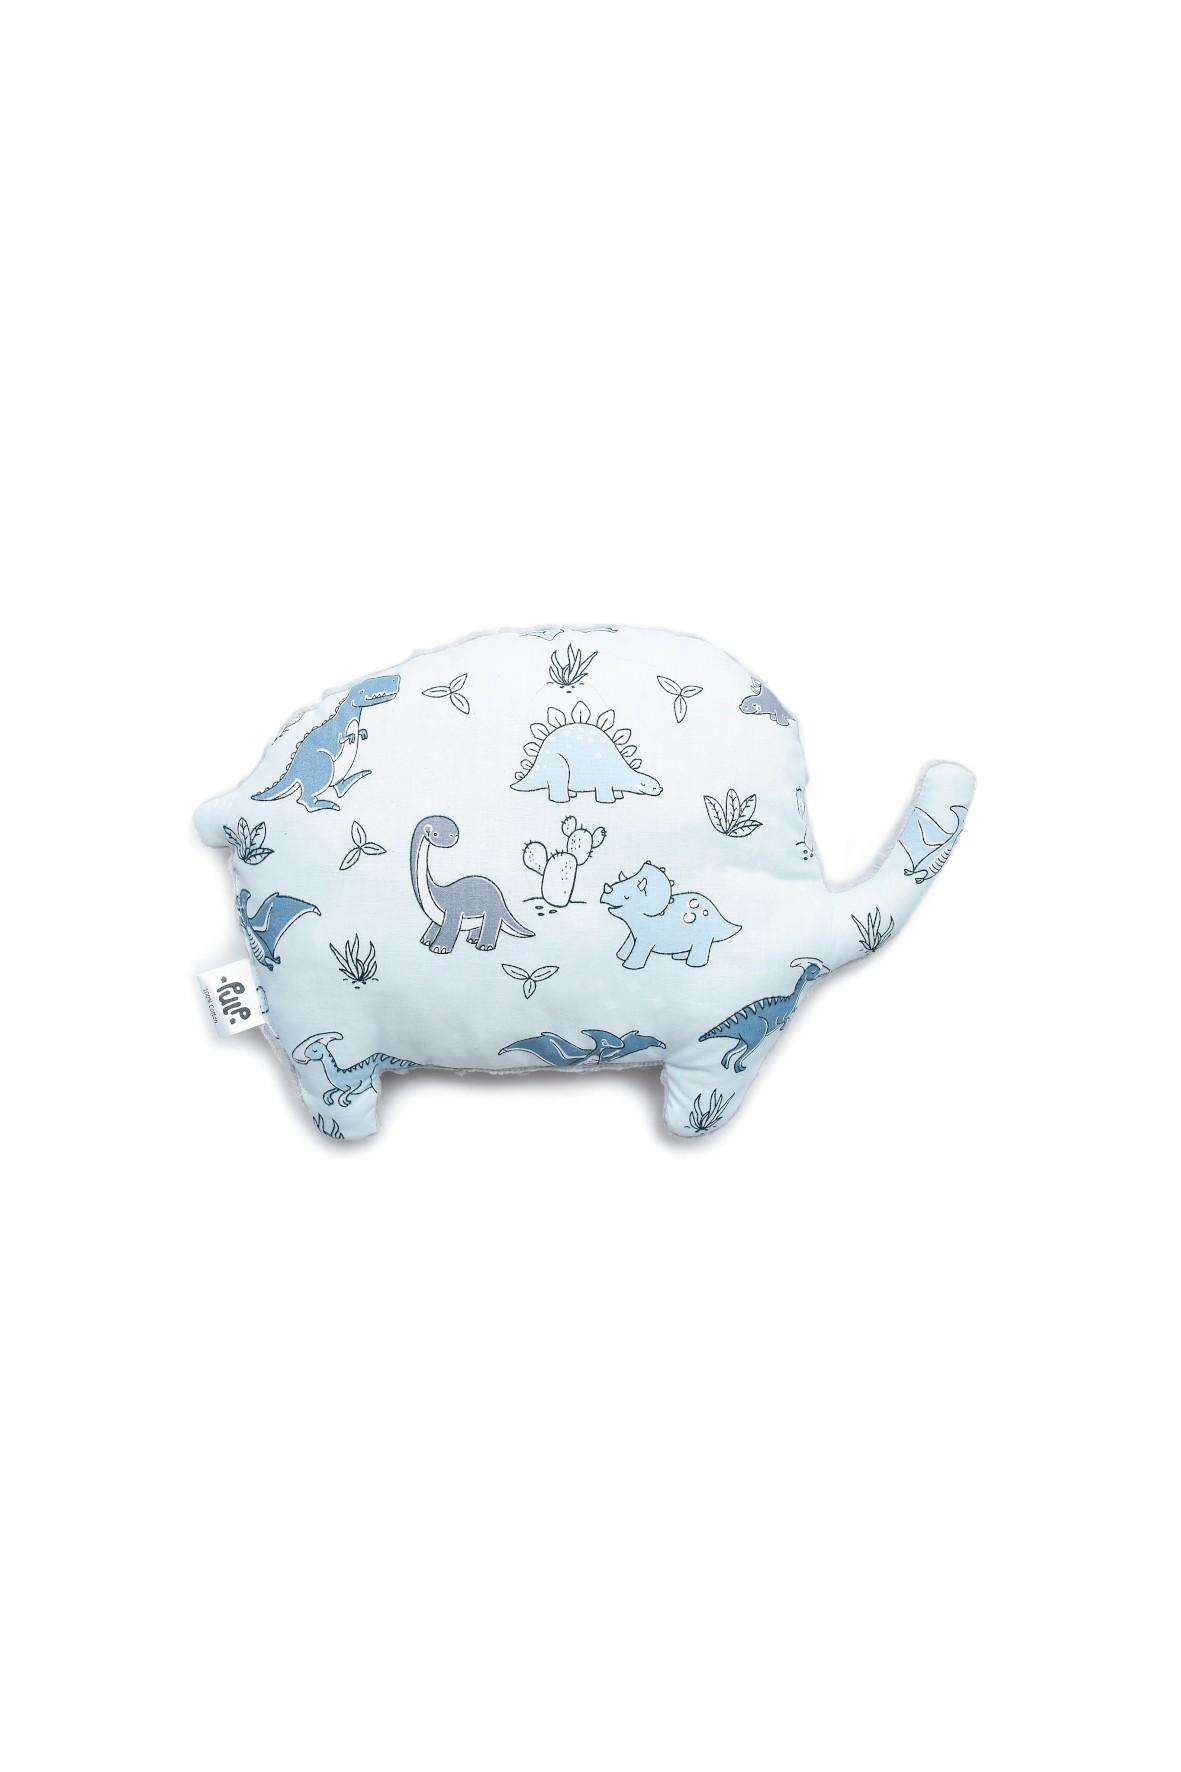 Poduszka Minky, słonik - Era dinozaurów